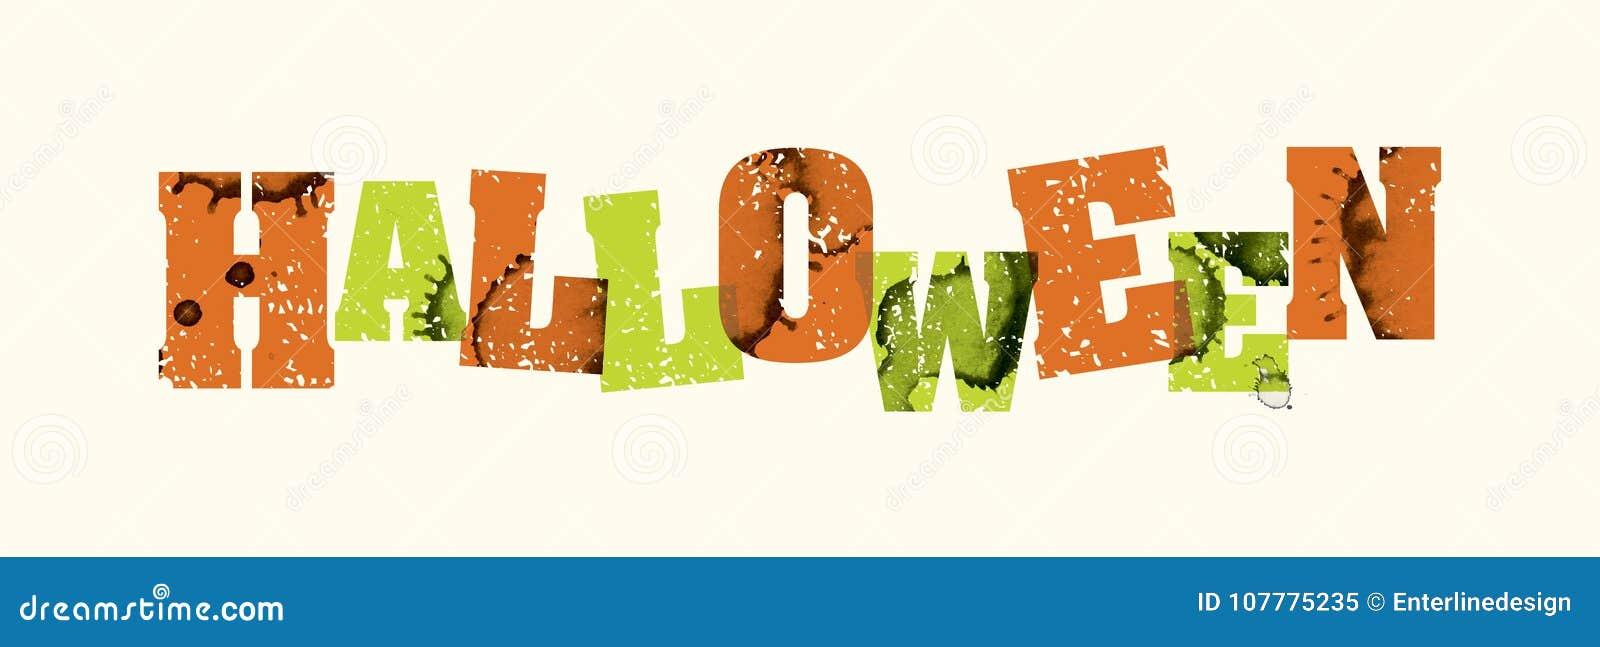 halloween concept stamped word art illustration stock vector